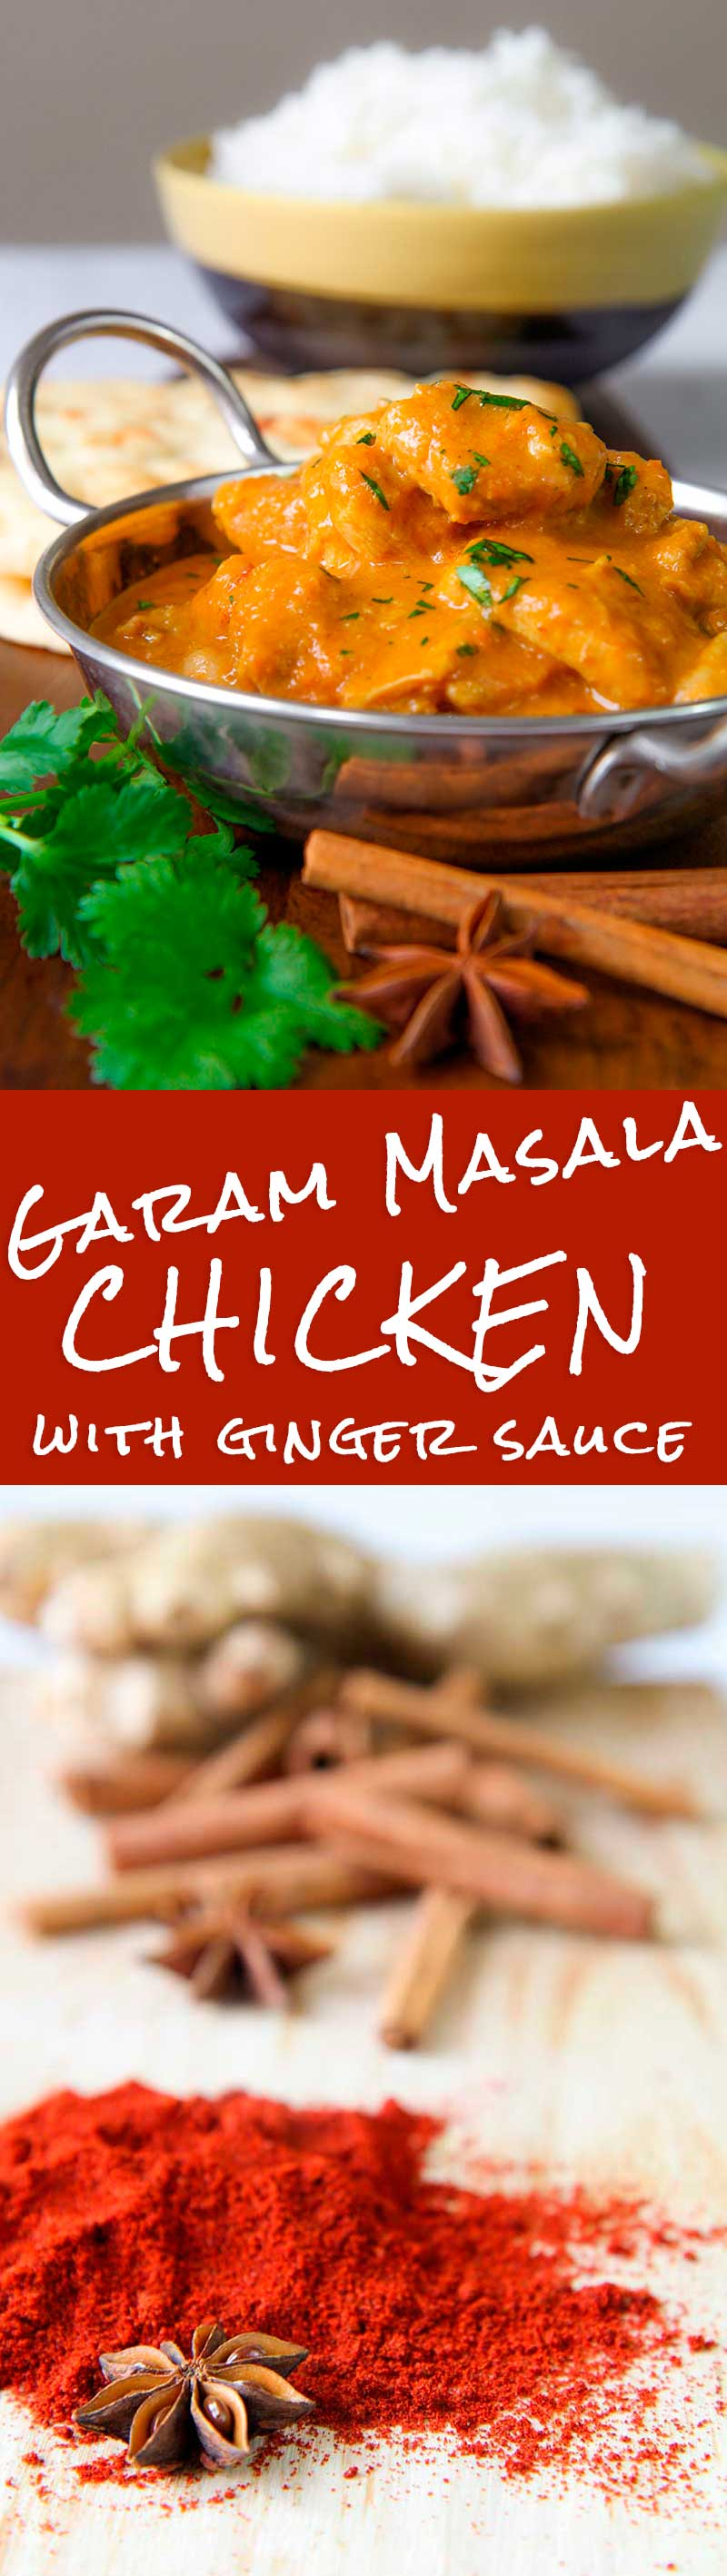 GARAM MASALA CHICKEN with fresh ginger and beer sauce